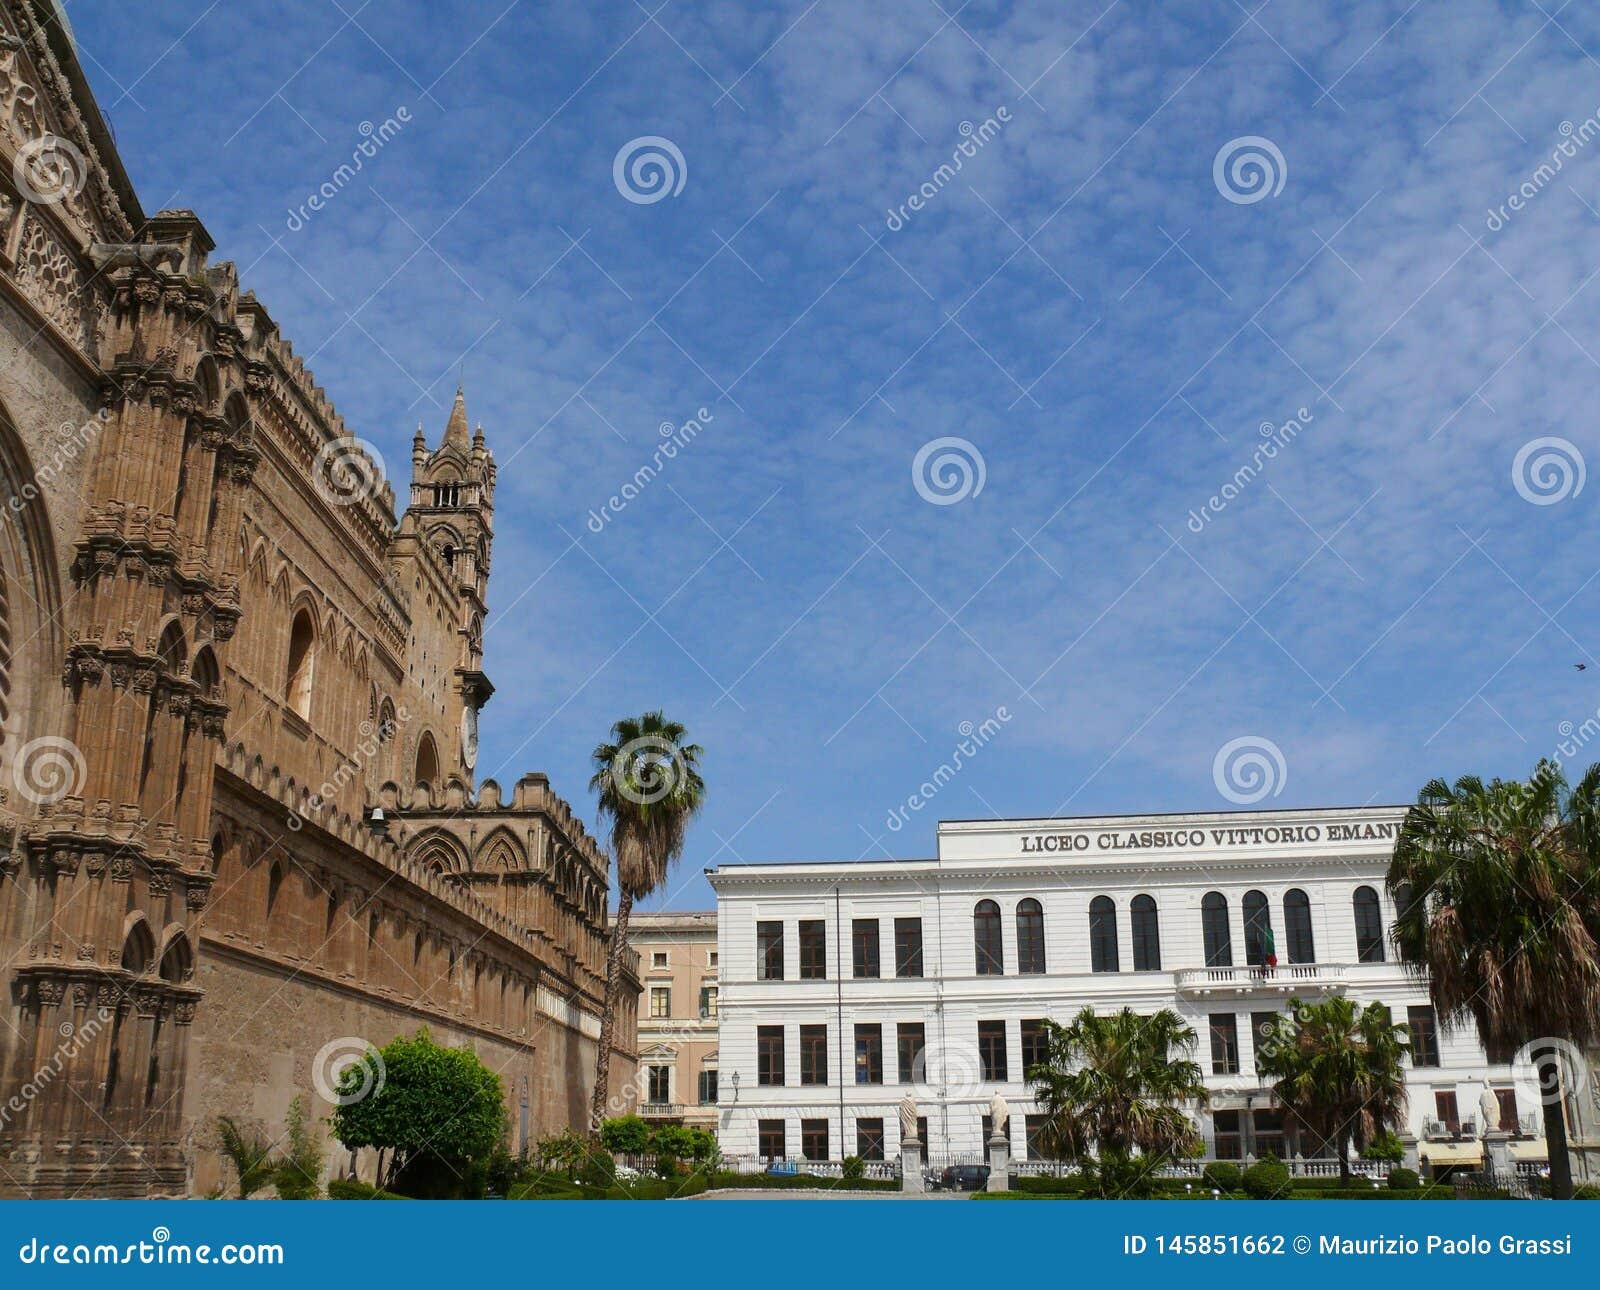 Palermo, Sicili?, Itali? 11/04/2010 Vittorio Emanuele II Schrijver uit de klassieke oudheid